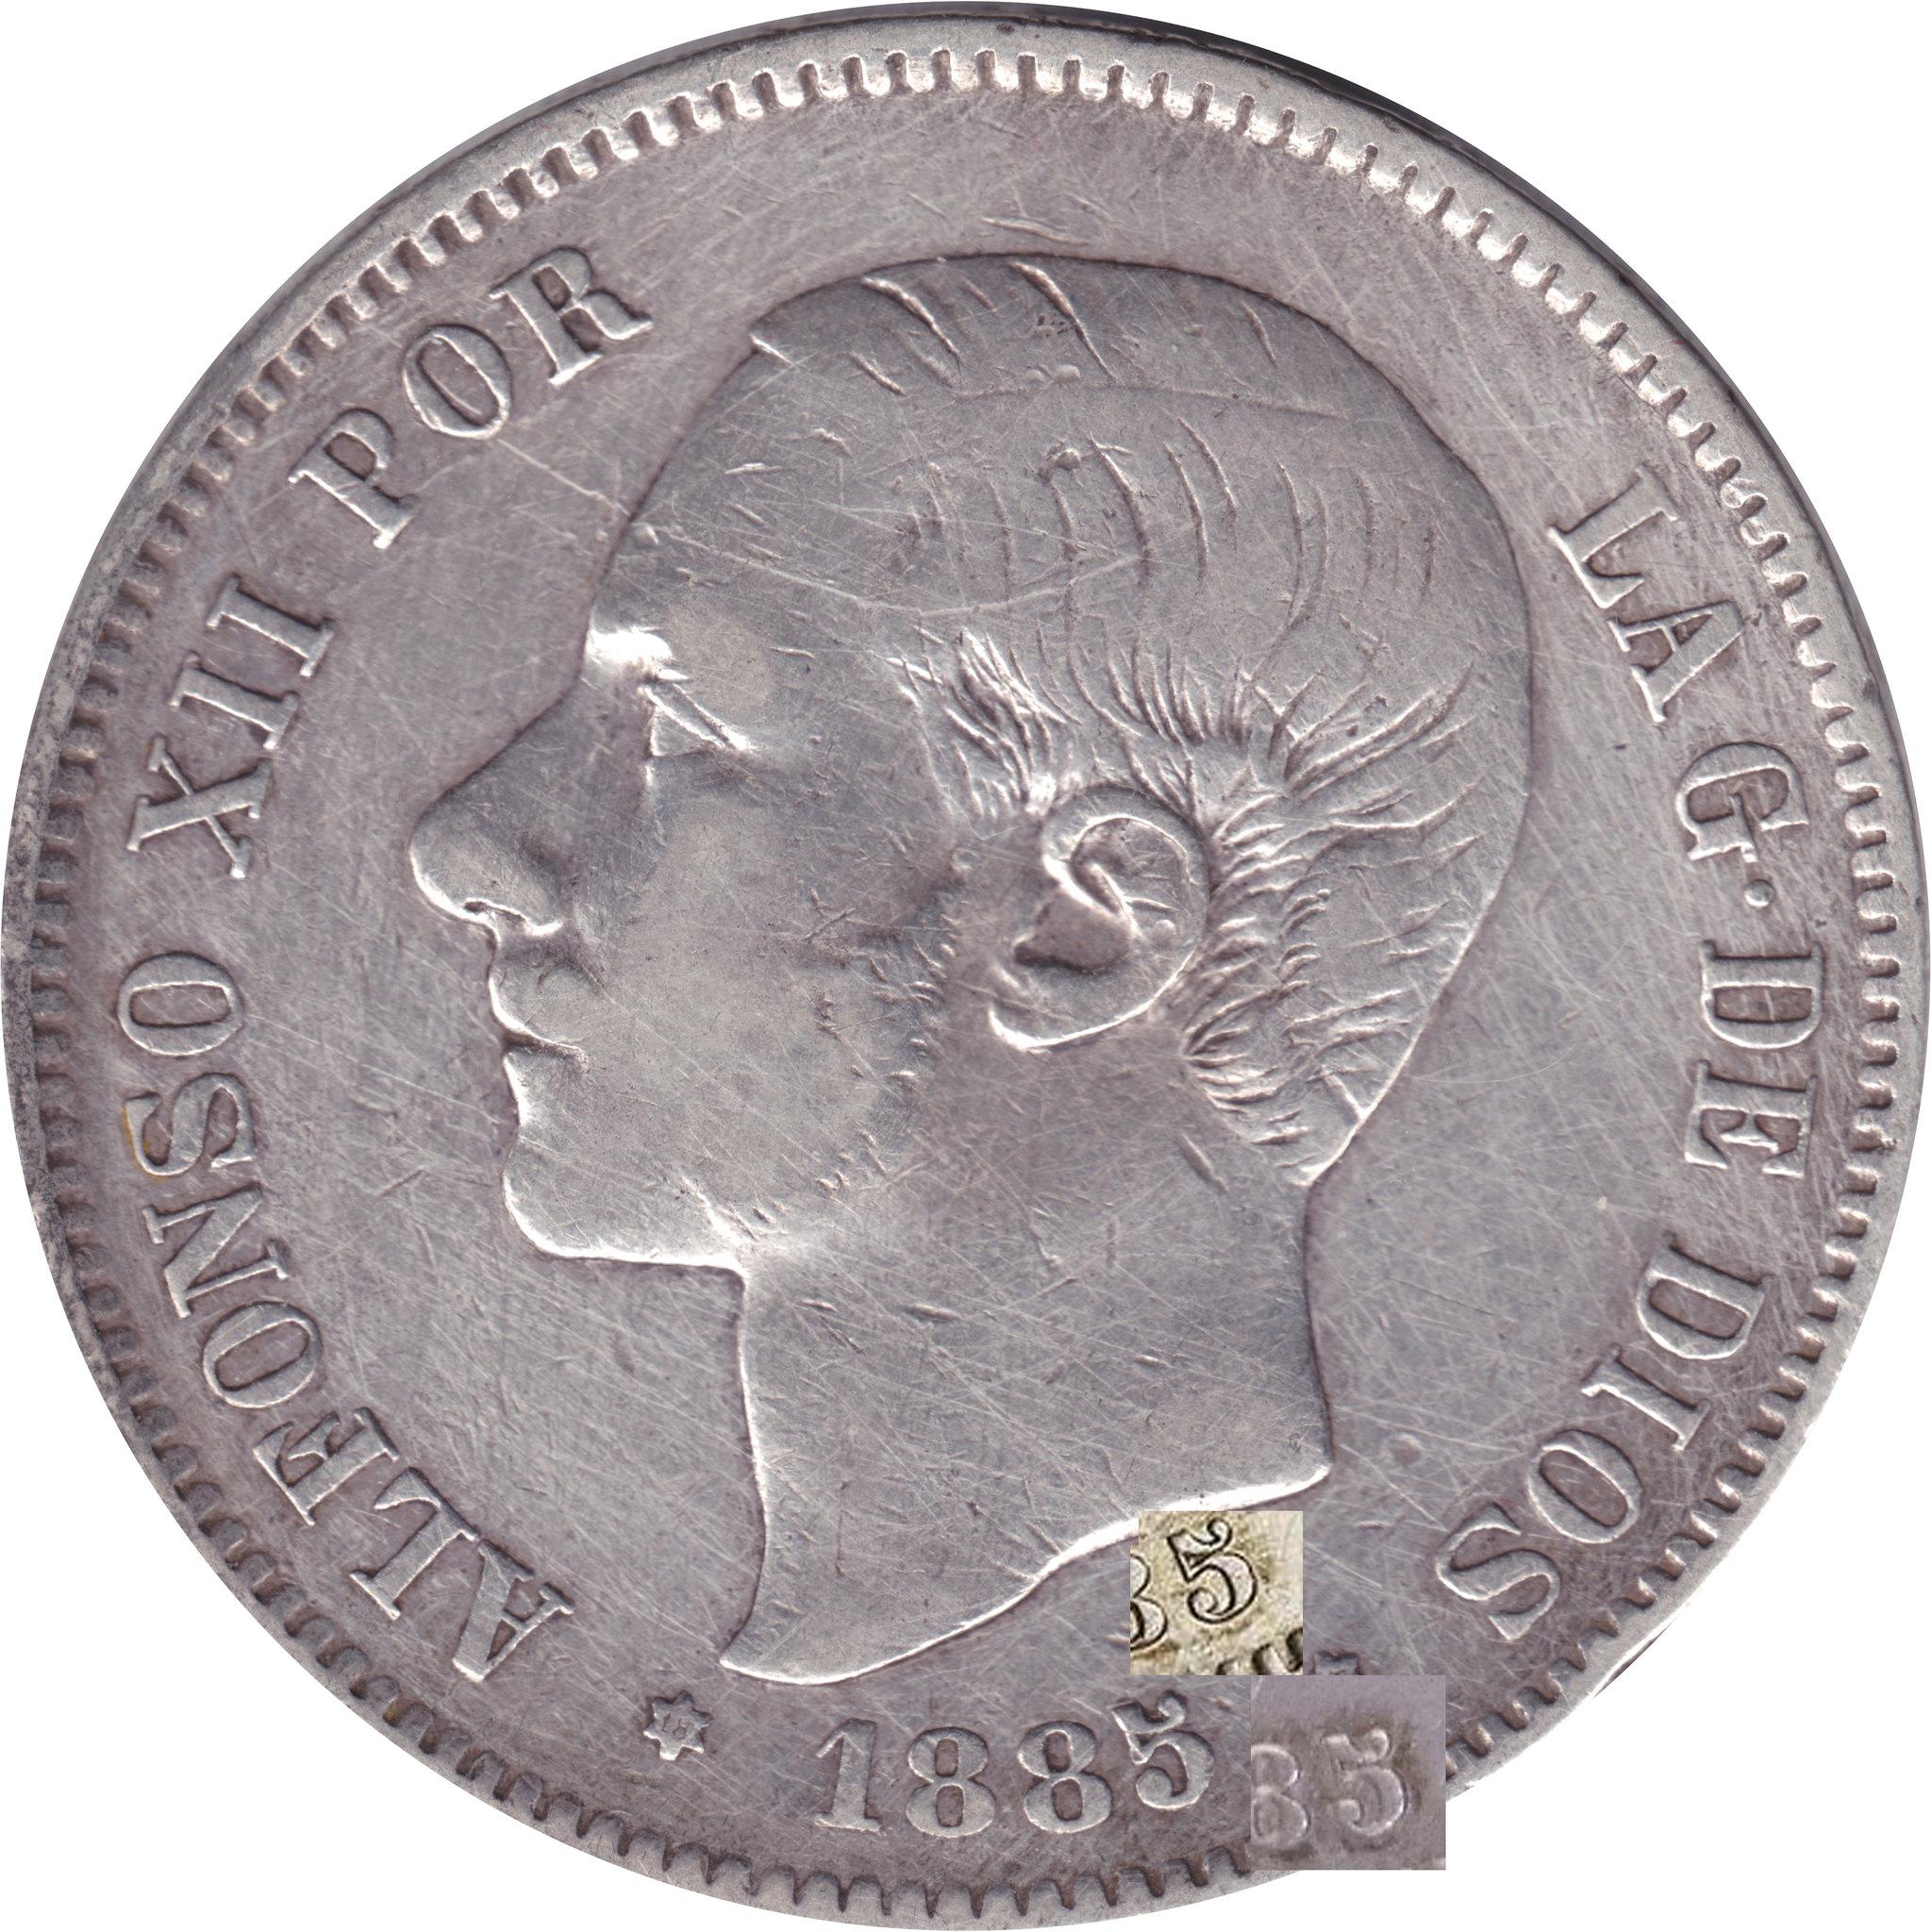 5 Pesetas Alfonso XII 1885 *18 * 87 M.S.M. Falsa o fallo? 8751772890_cd1b8560f1_k